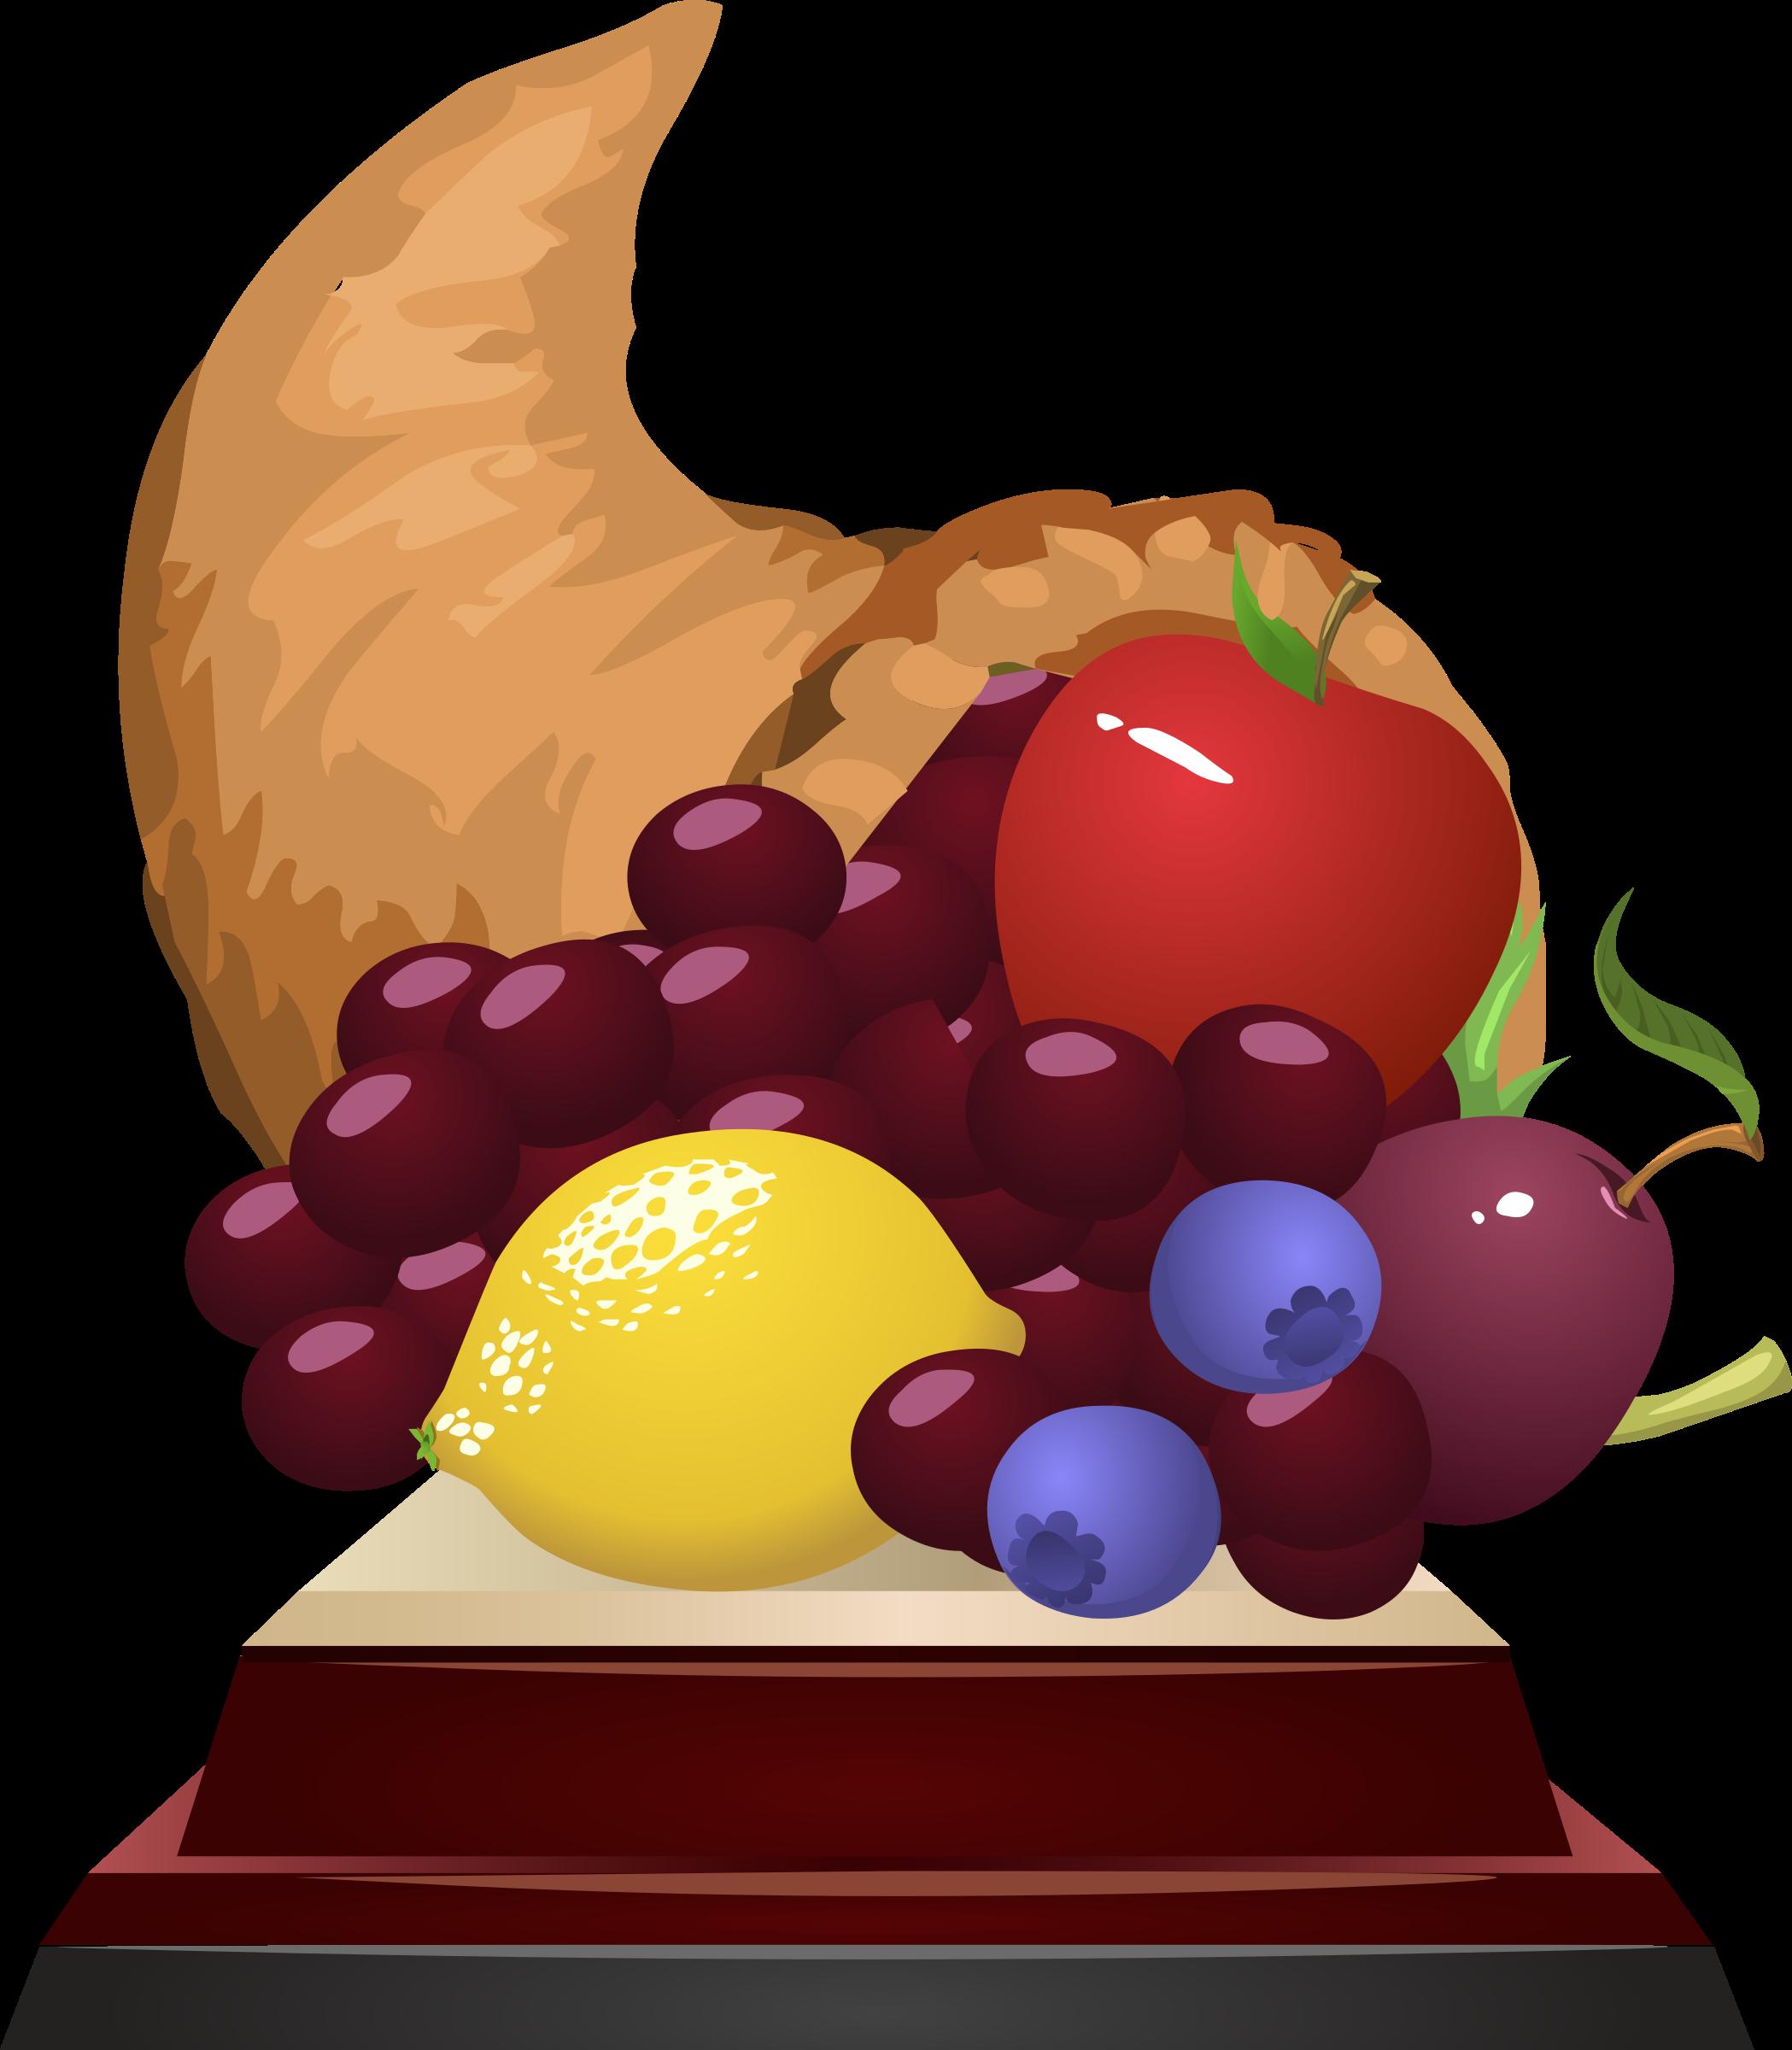 Glitch clipart family love Clipart Trophy Trophy Fruit Fruit